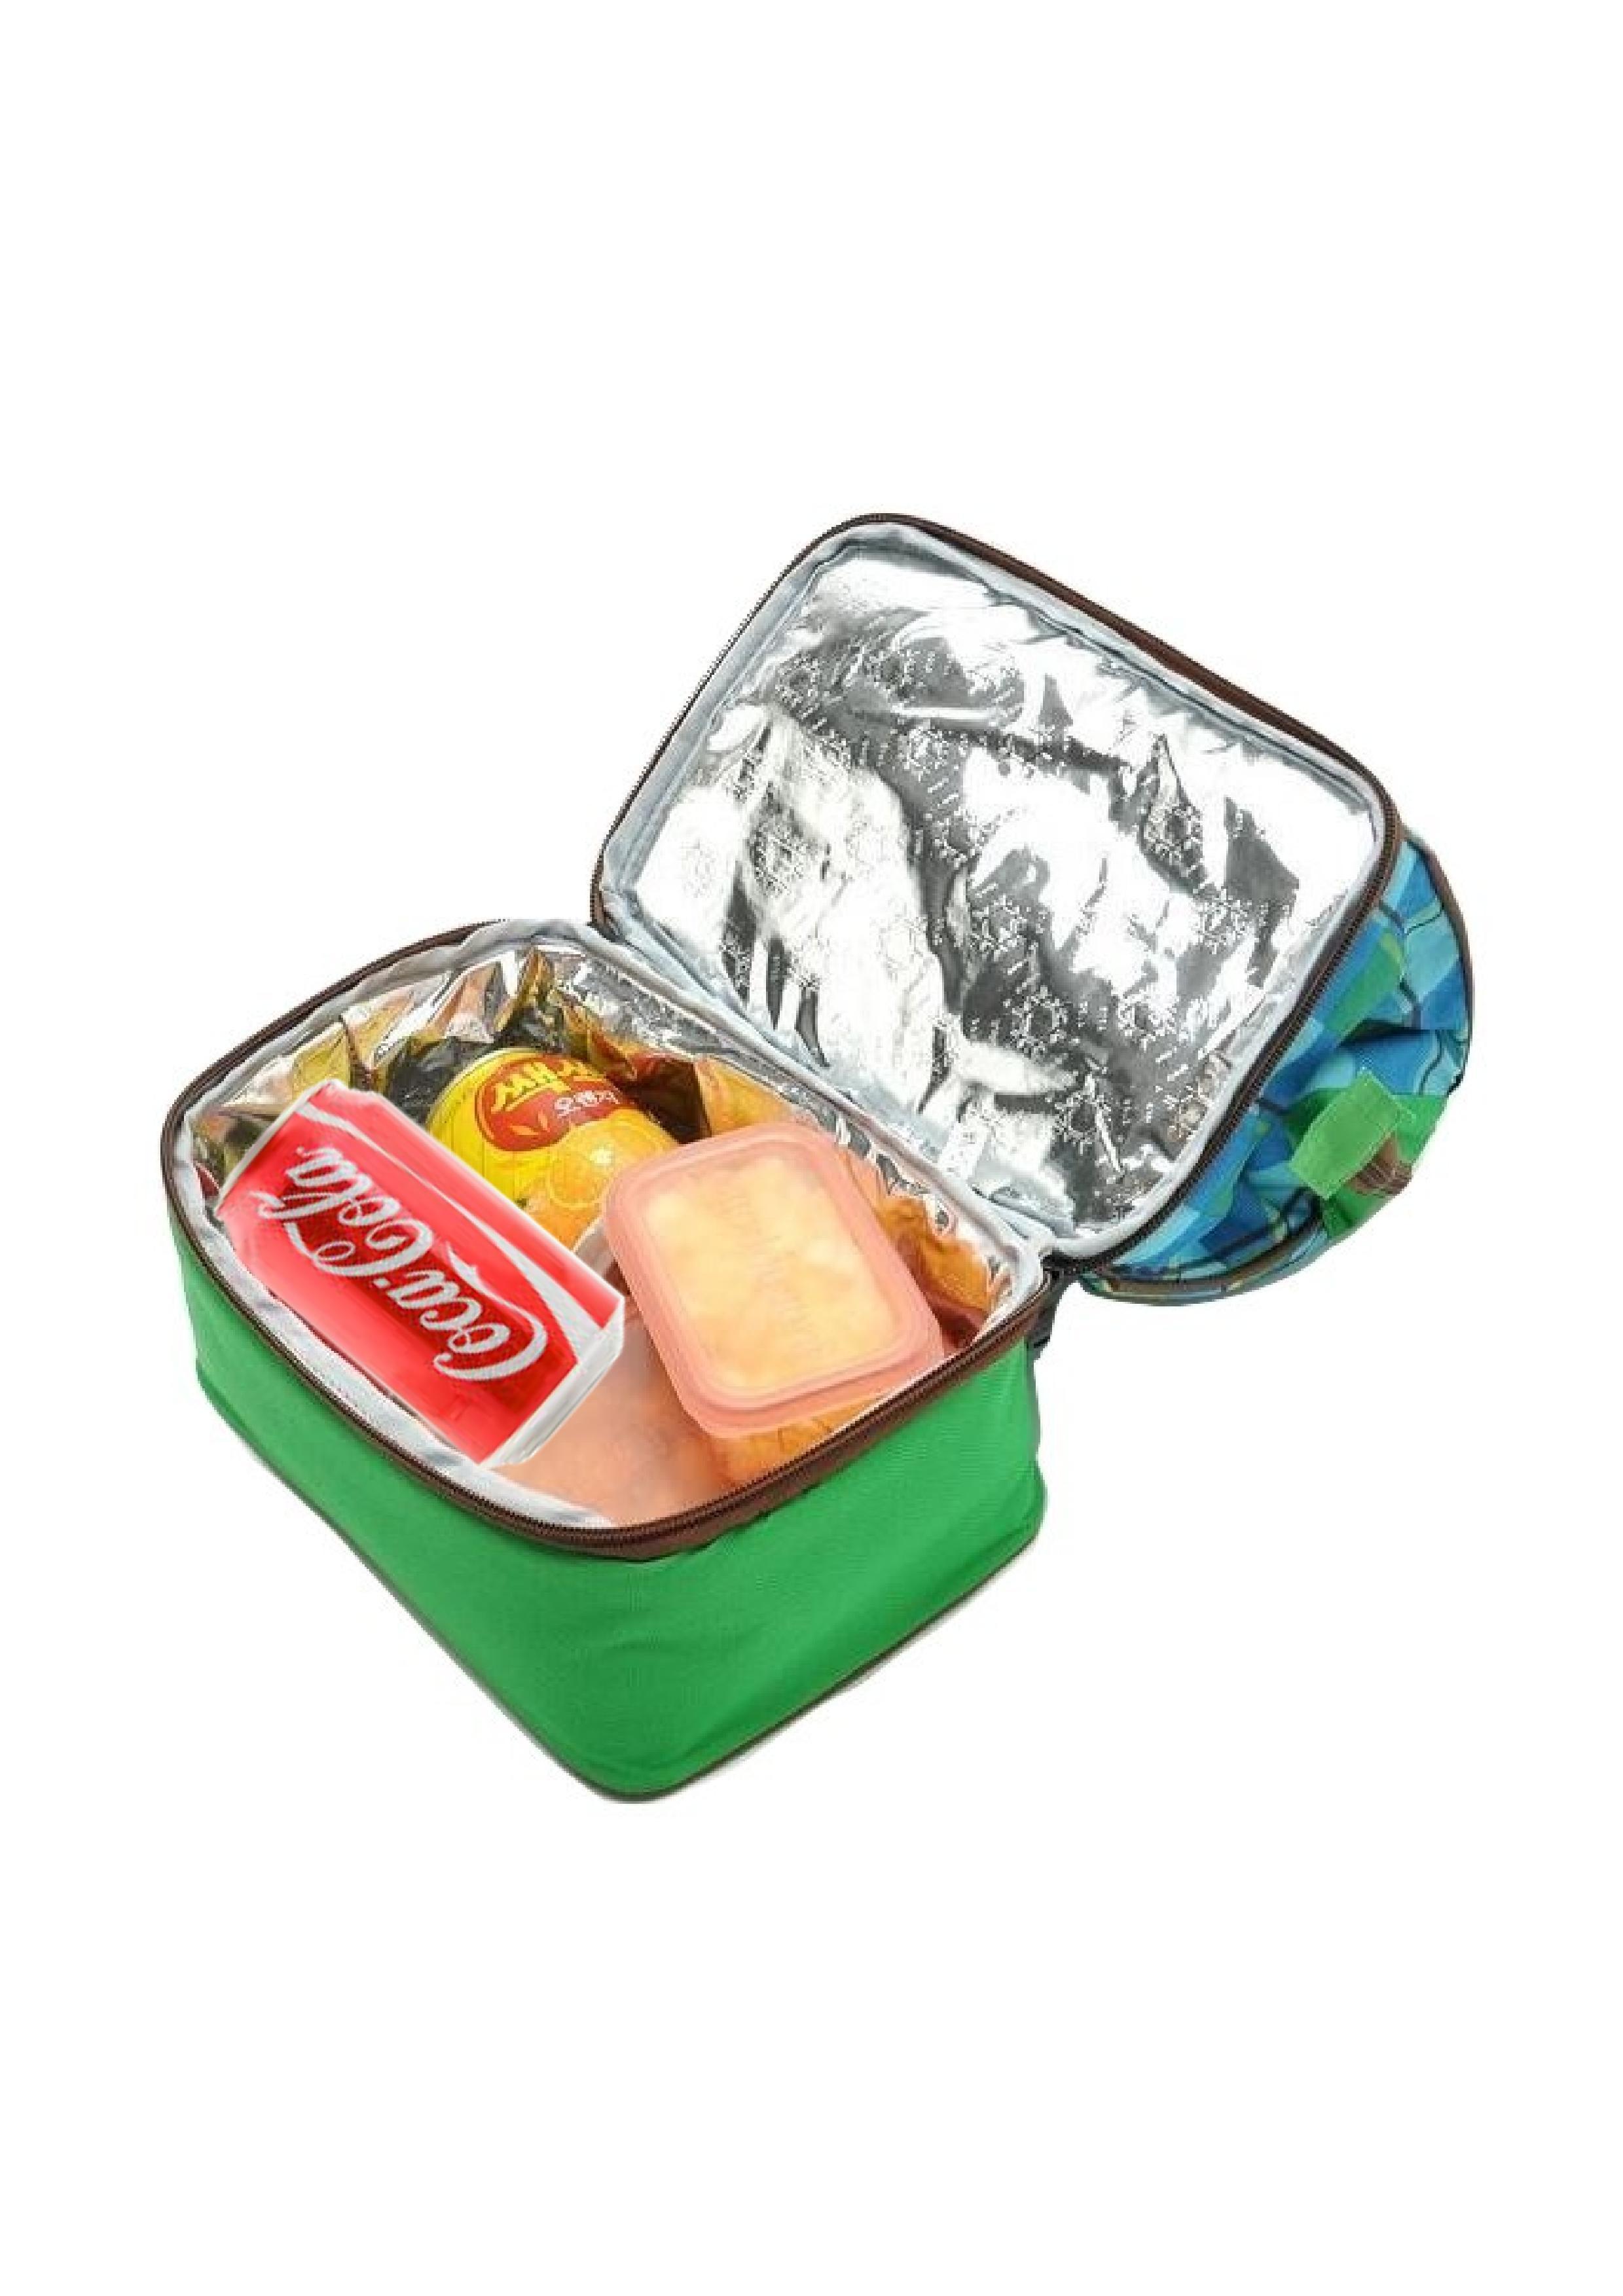 Insulated Meal Bag Prepared Food Cooler Bag